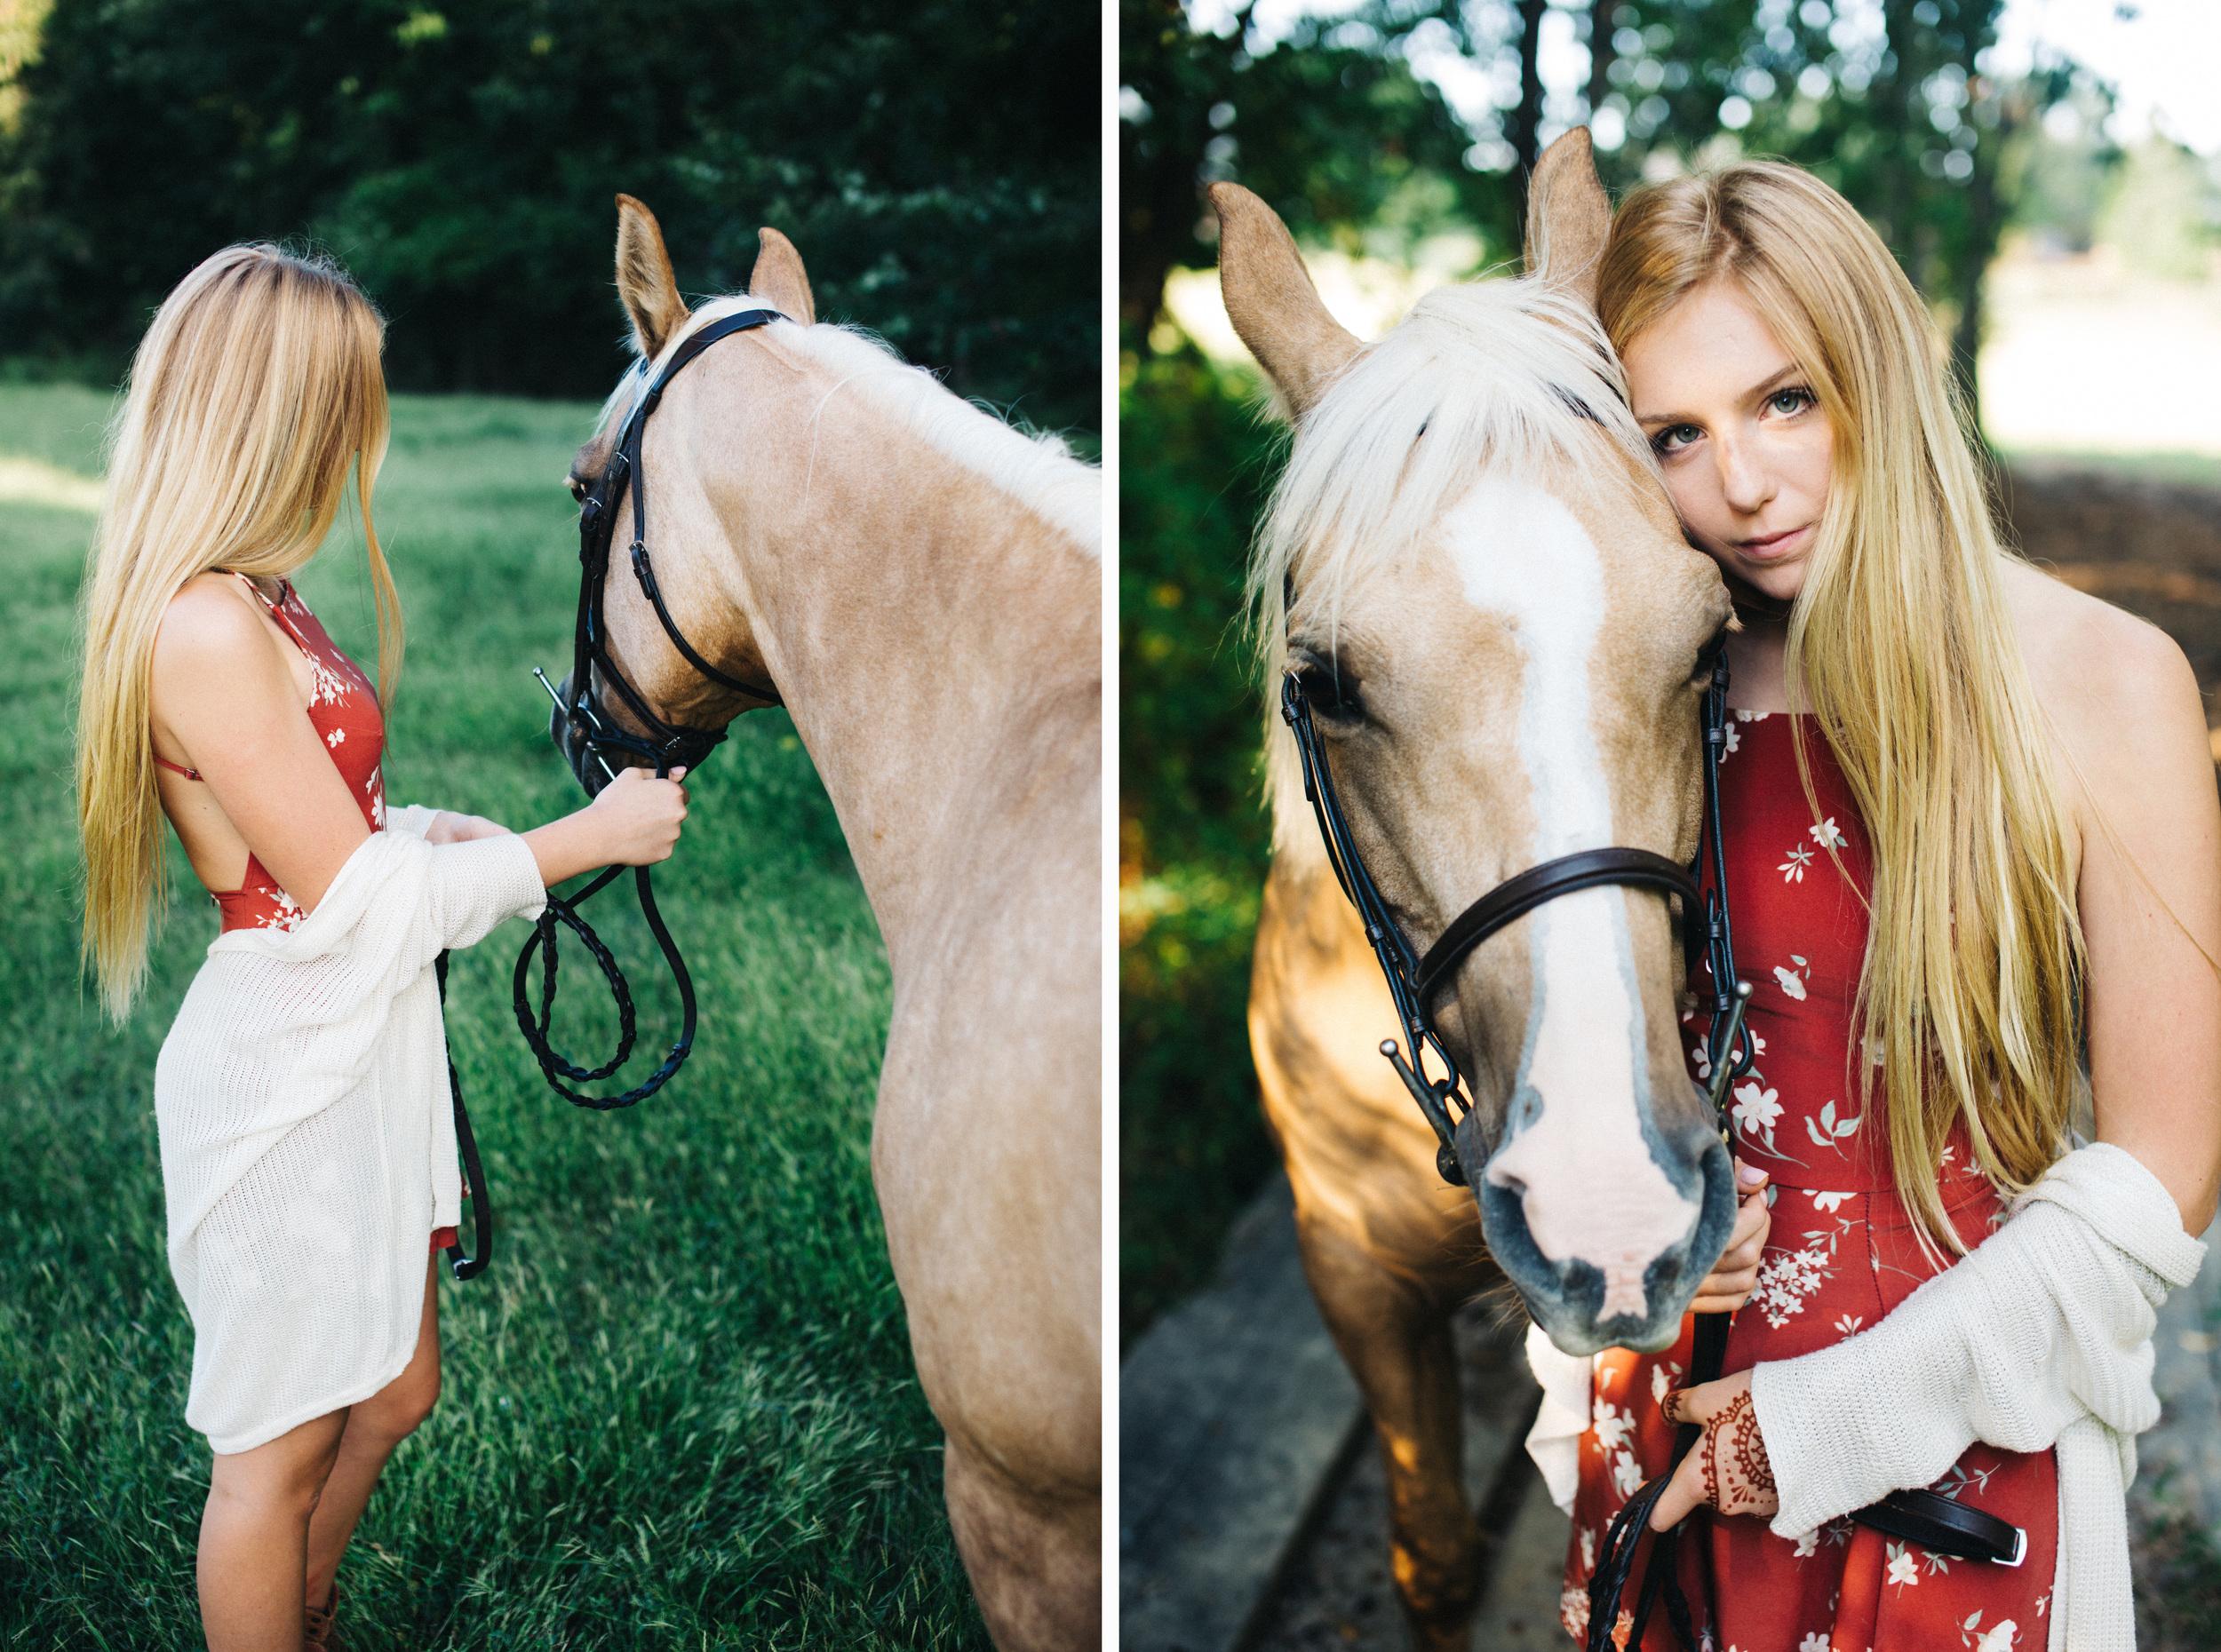 annapolis-maryland-senior-portrait-session-photographer-boho-horse-inspo-emma-jean-photography-1-photo.jpg